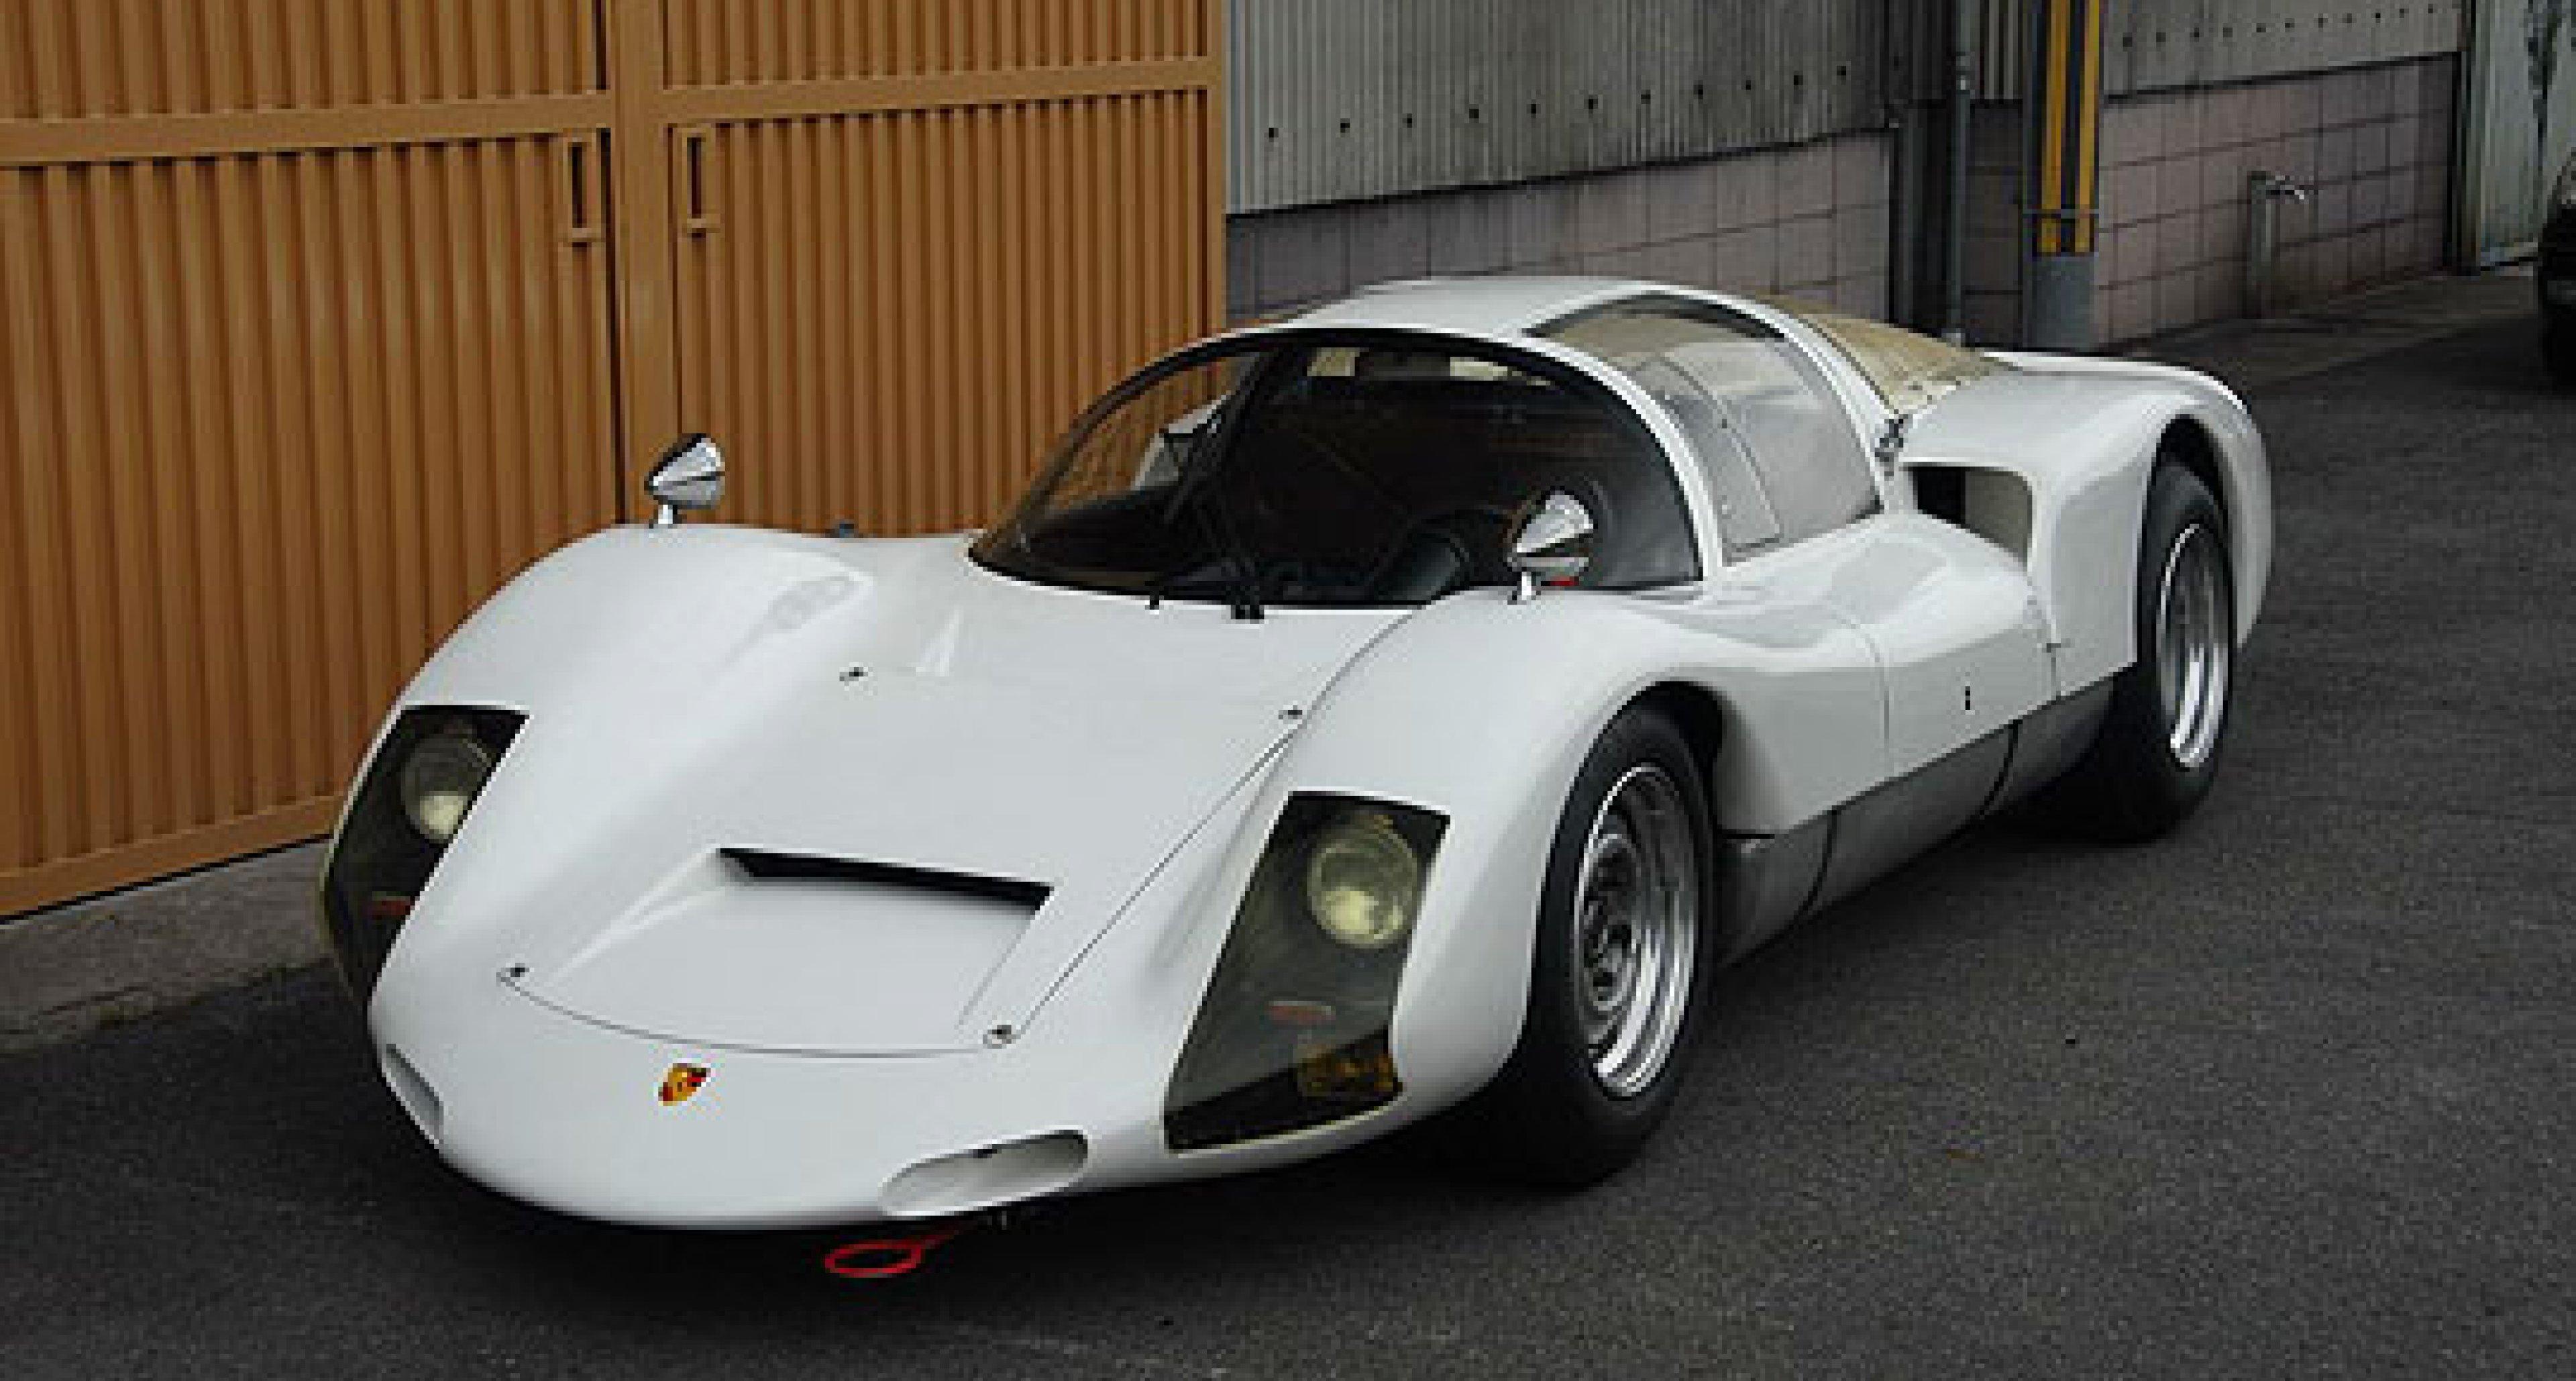 Historic Prototype Porsche Sports Racer for Sale